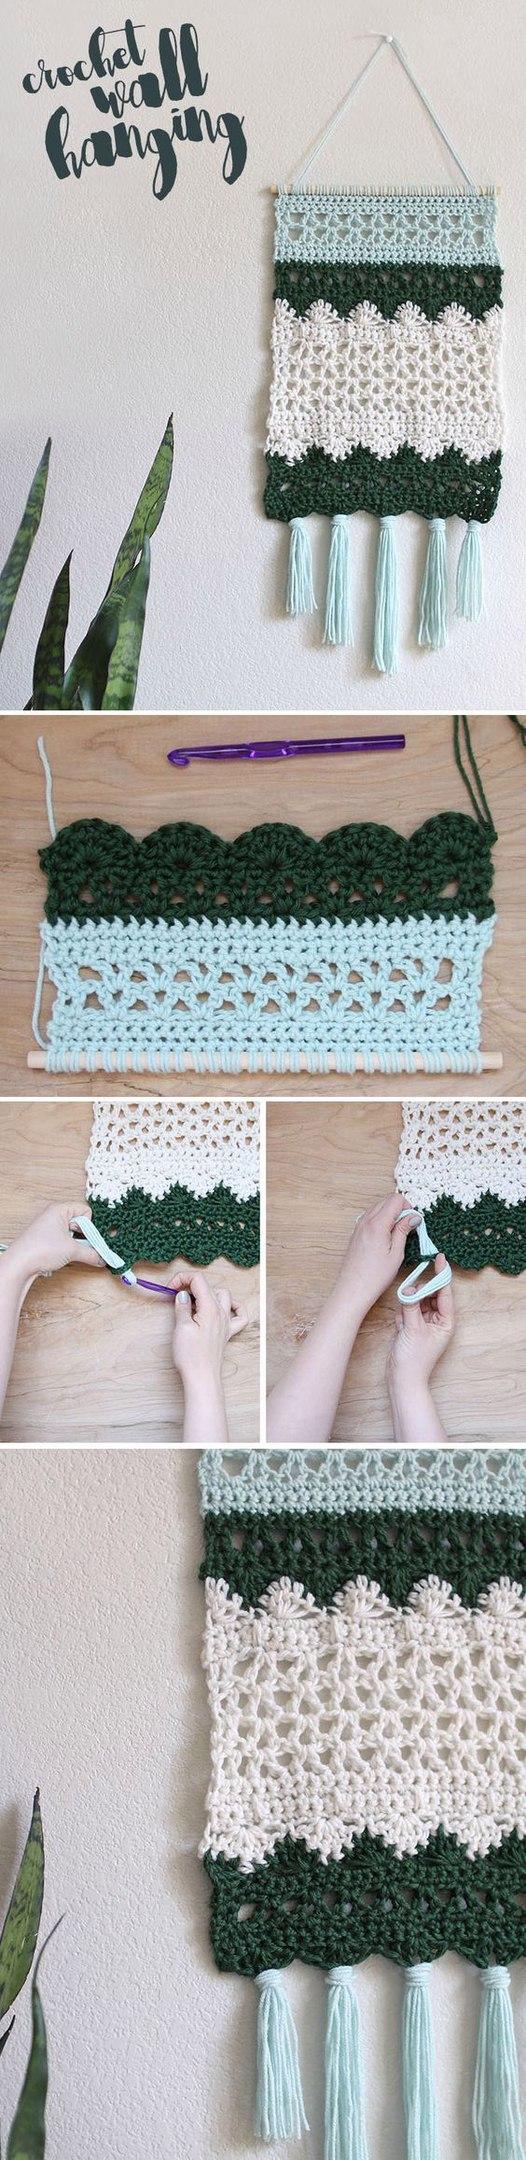 Crochet everything. Schemes. Ideas. Все крючком. | ЛОВЕЦ СНОВ.МУЗЫКА ...